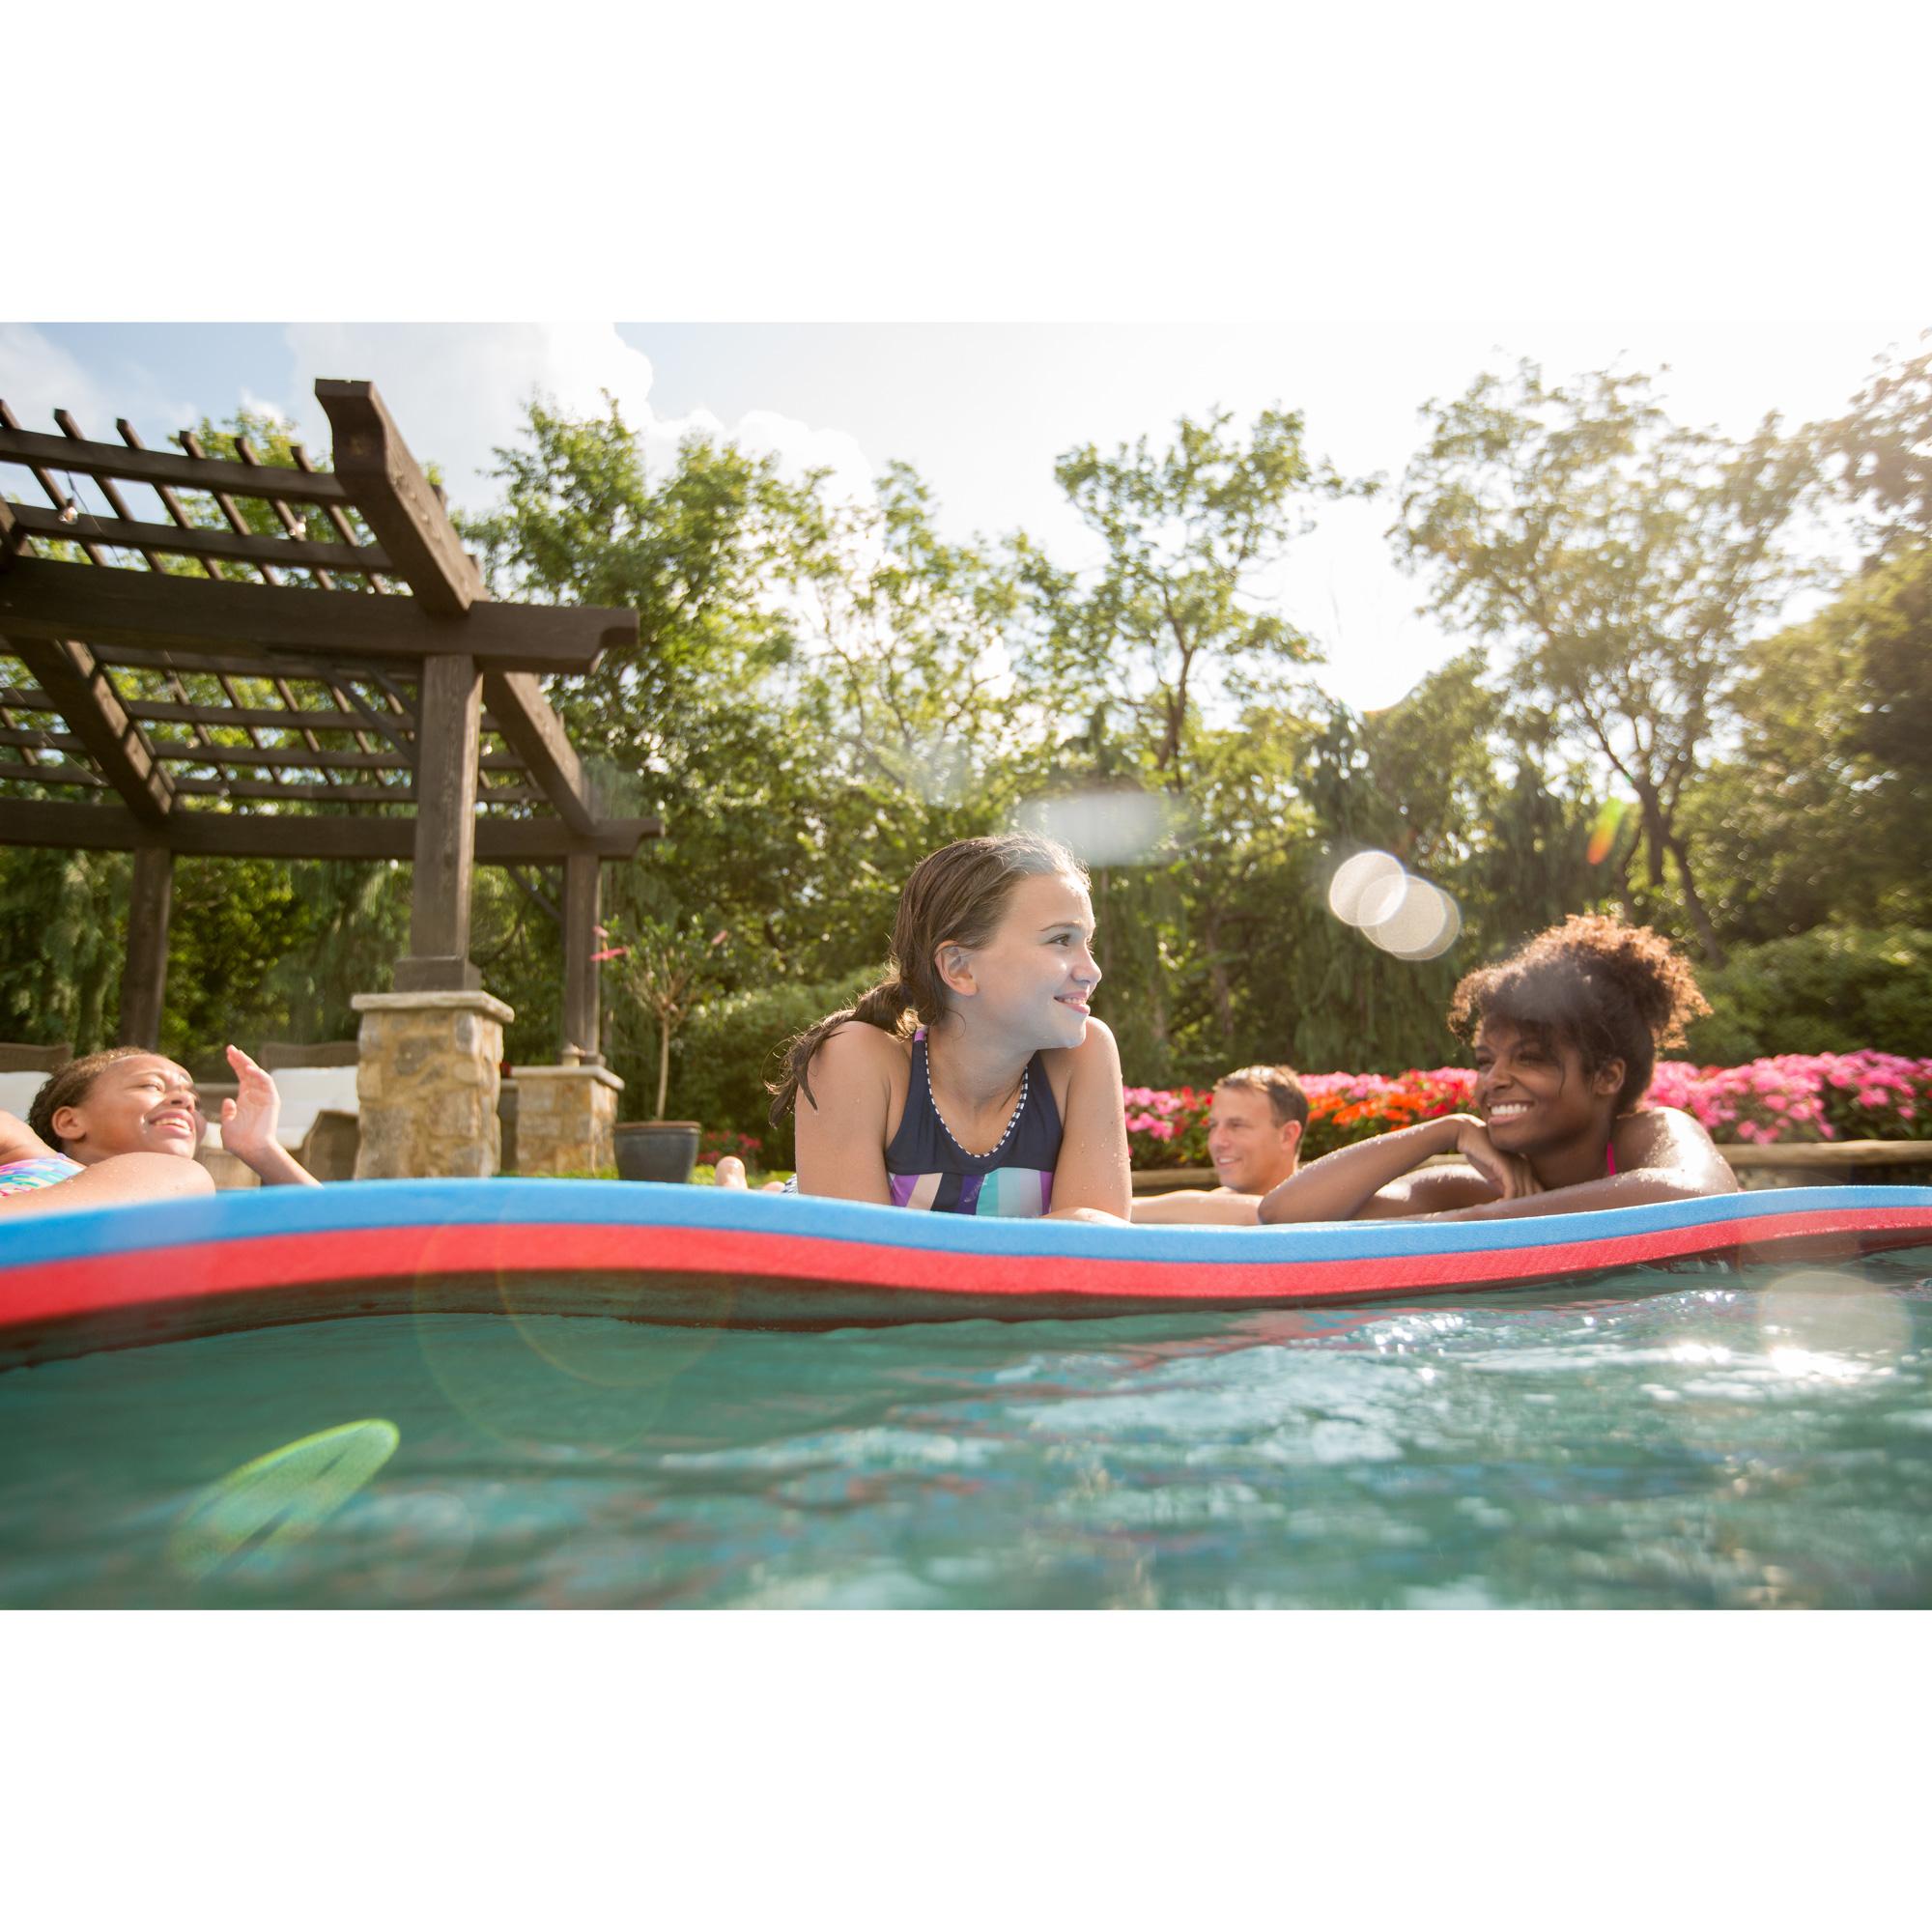 Floatation iQ Floating Oasis 15 x 6 Ft Foam Island Water ...